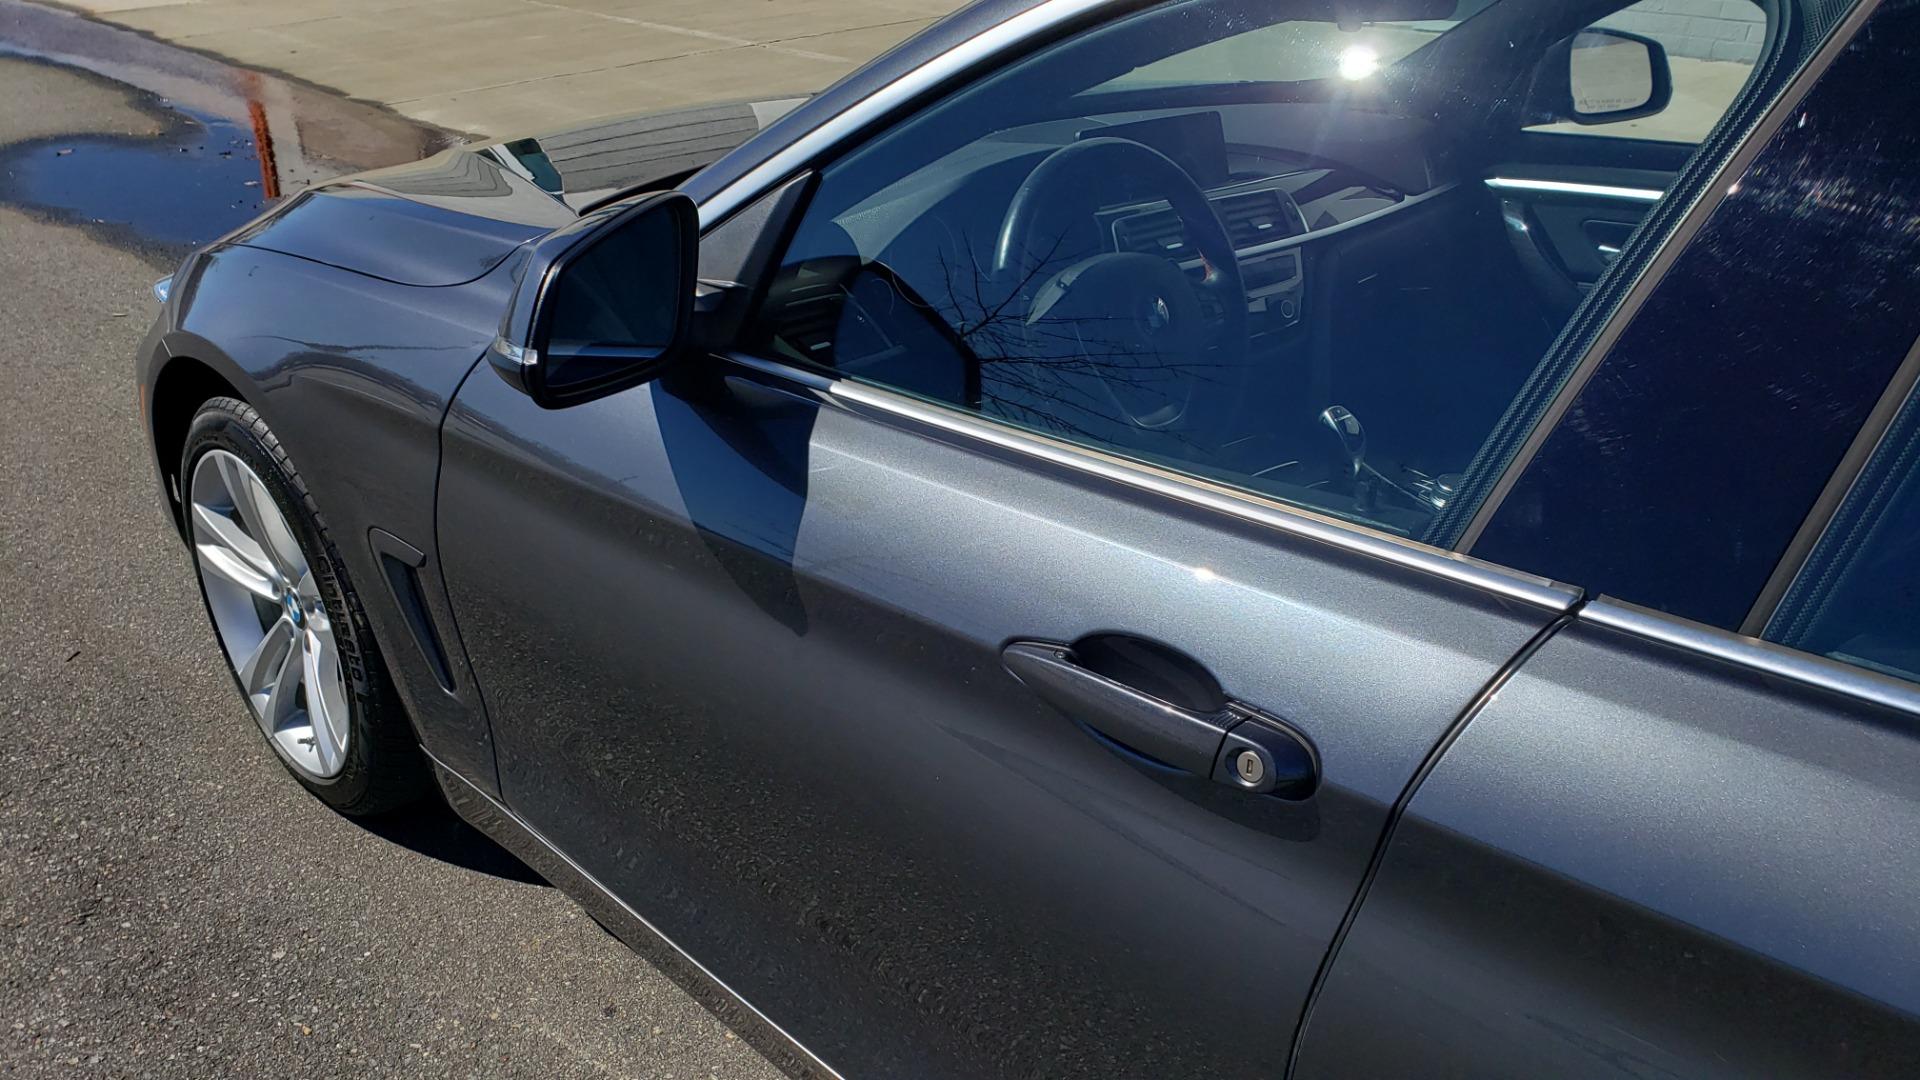 Used 2018 BMW 4 SERIES 430IXDRIVE / PREMIUM / NAV / SUNROOF / ESSENTIALS PKG for sale $29,495 at Formula Imports in Charlotte NC 28227 5